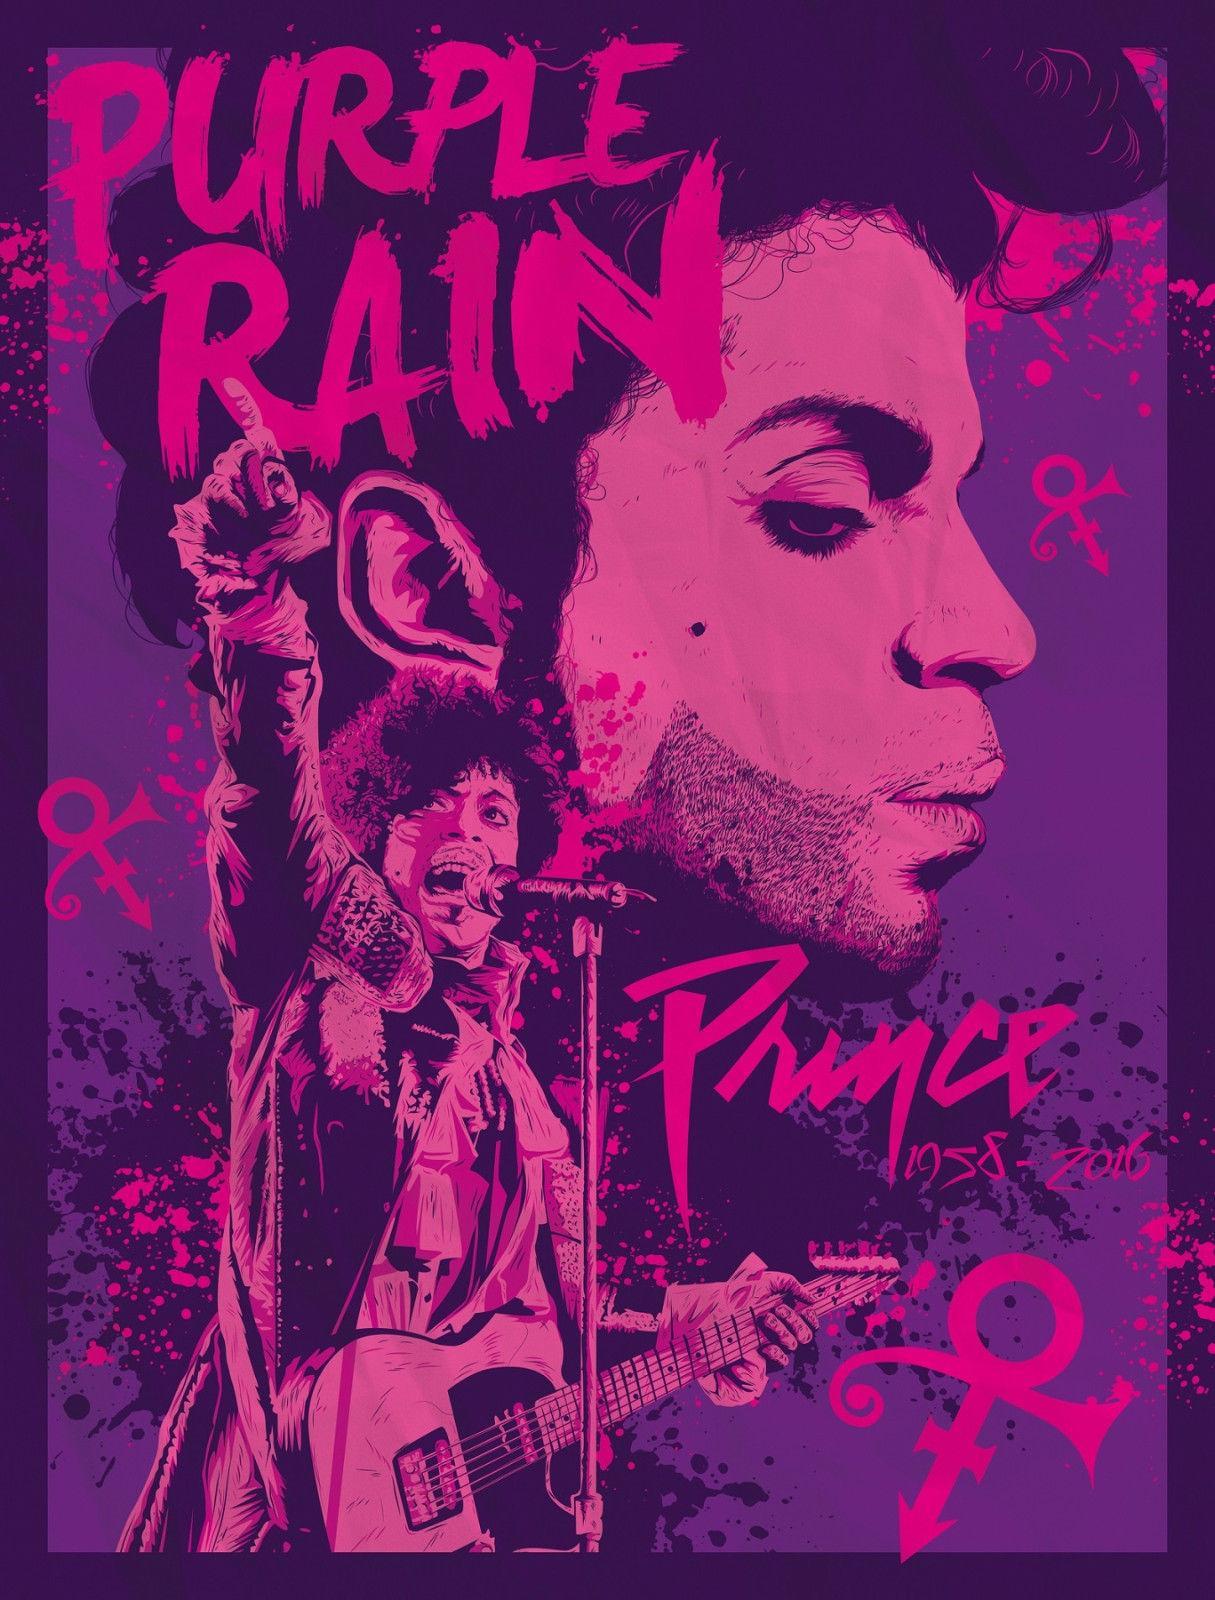 Prince Purple Rain Digital Art Silk Print Poster 24x36inch(60x90cm) 018